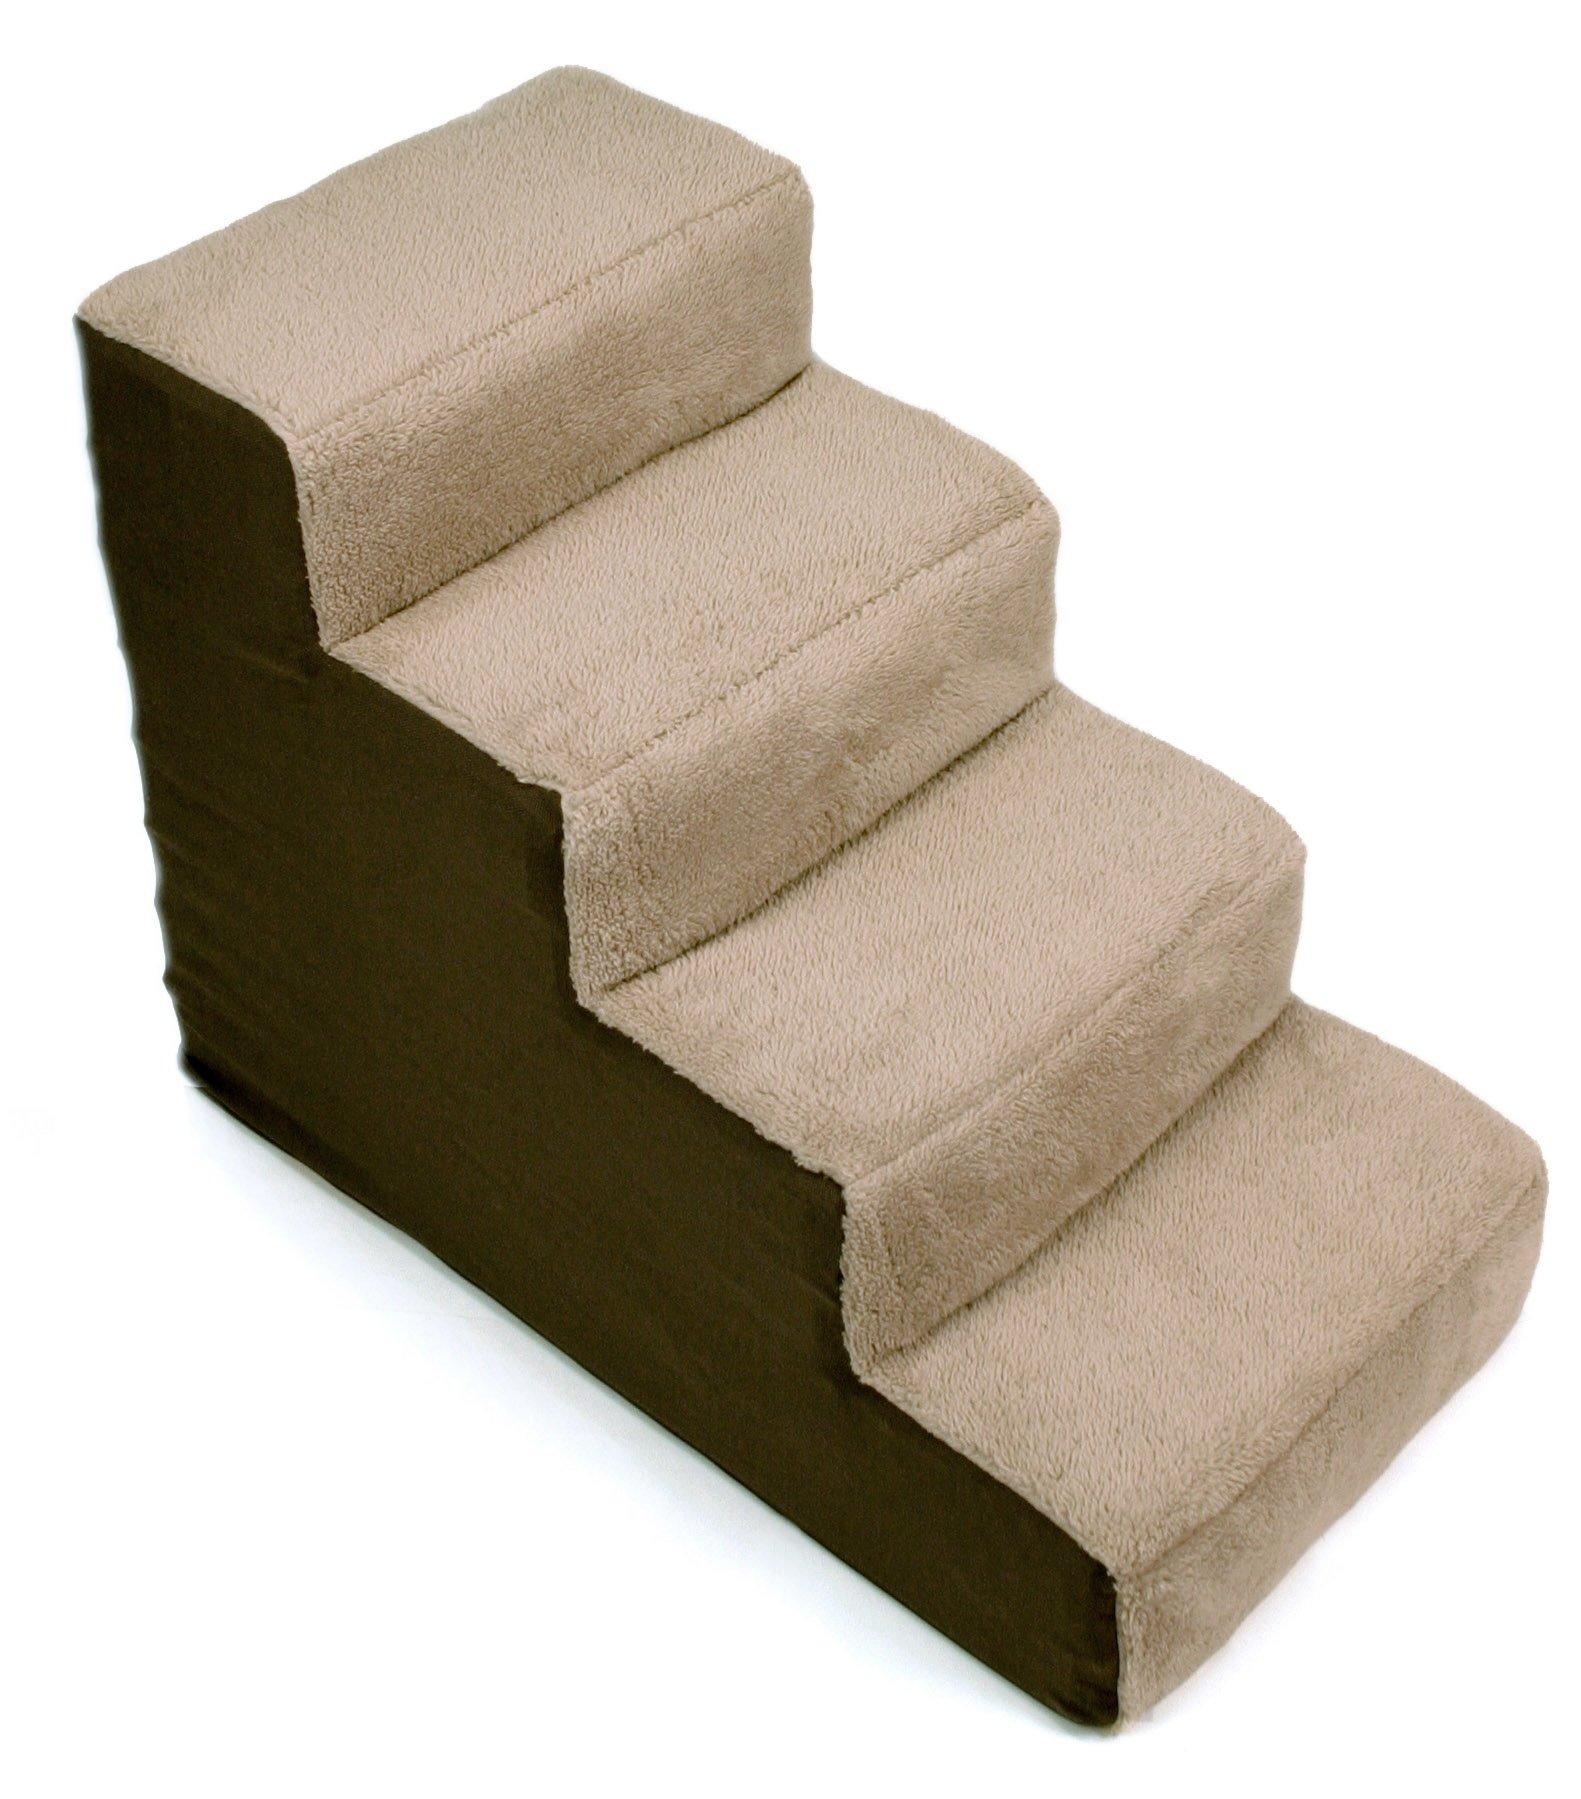 Dallas Manufacturing Co. 4 Step Home Décor Pet Steps, Brown & Tan